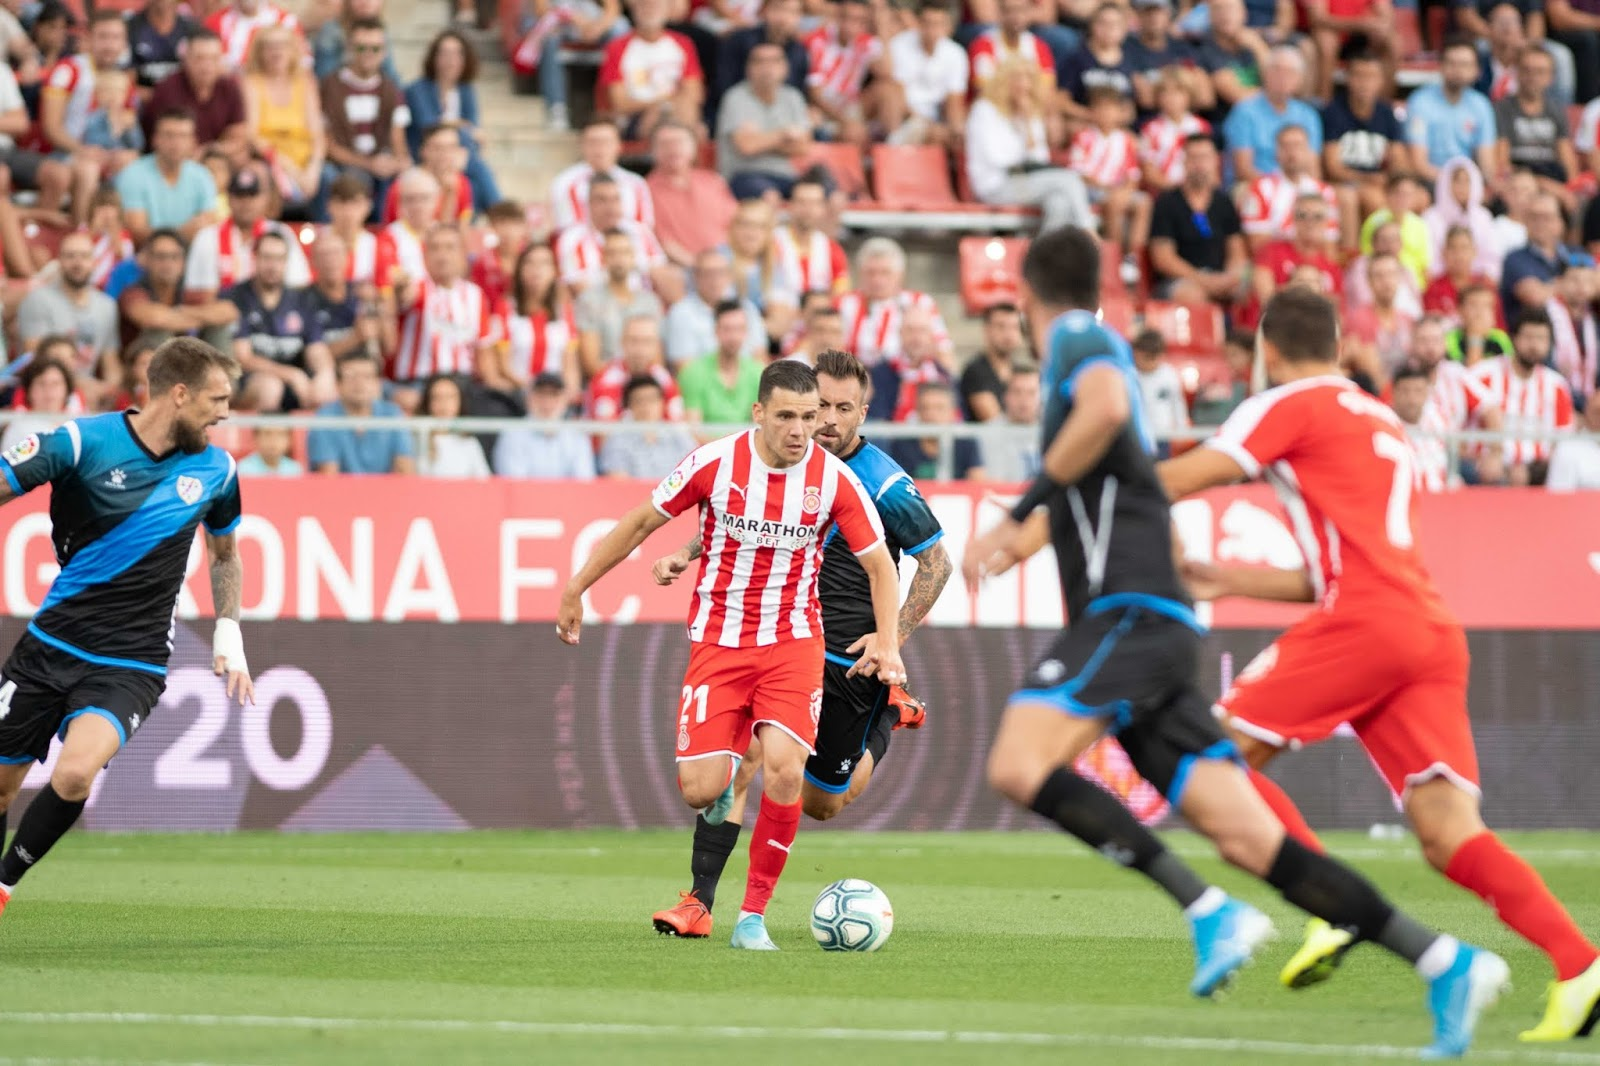 Soi kèo Girona vs Vallecano